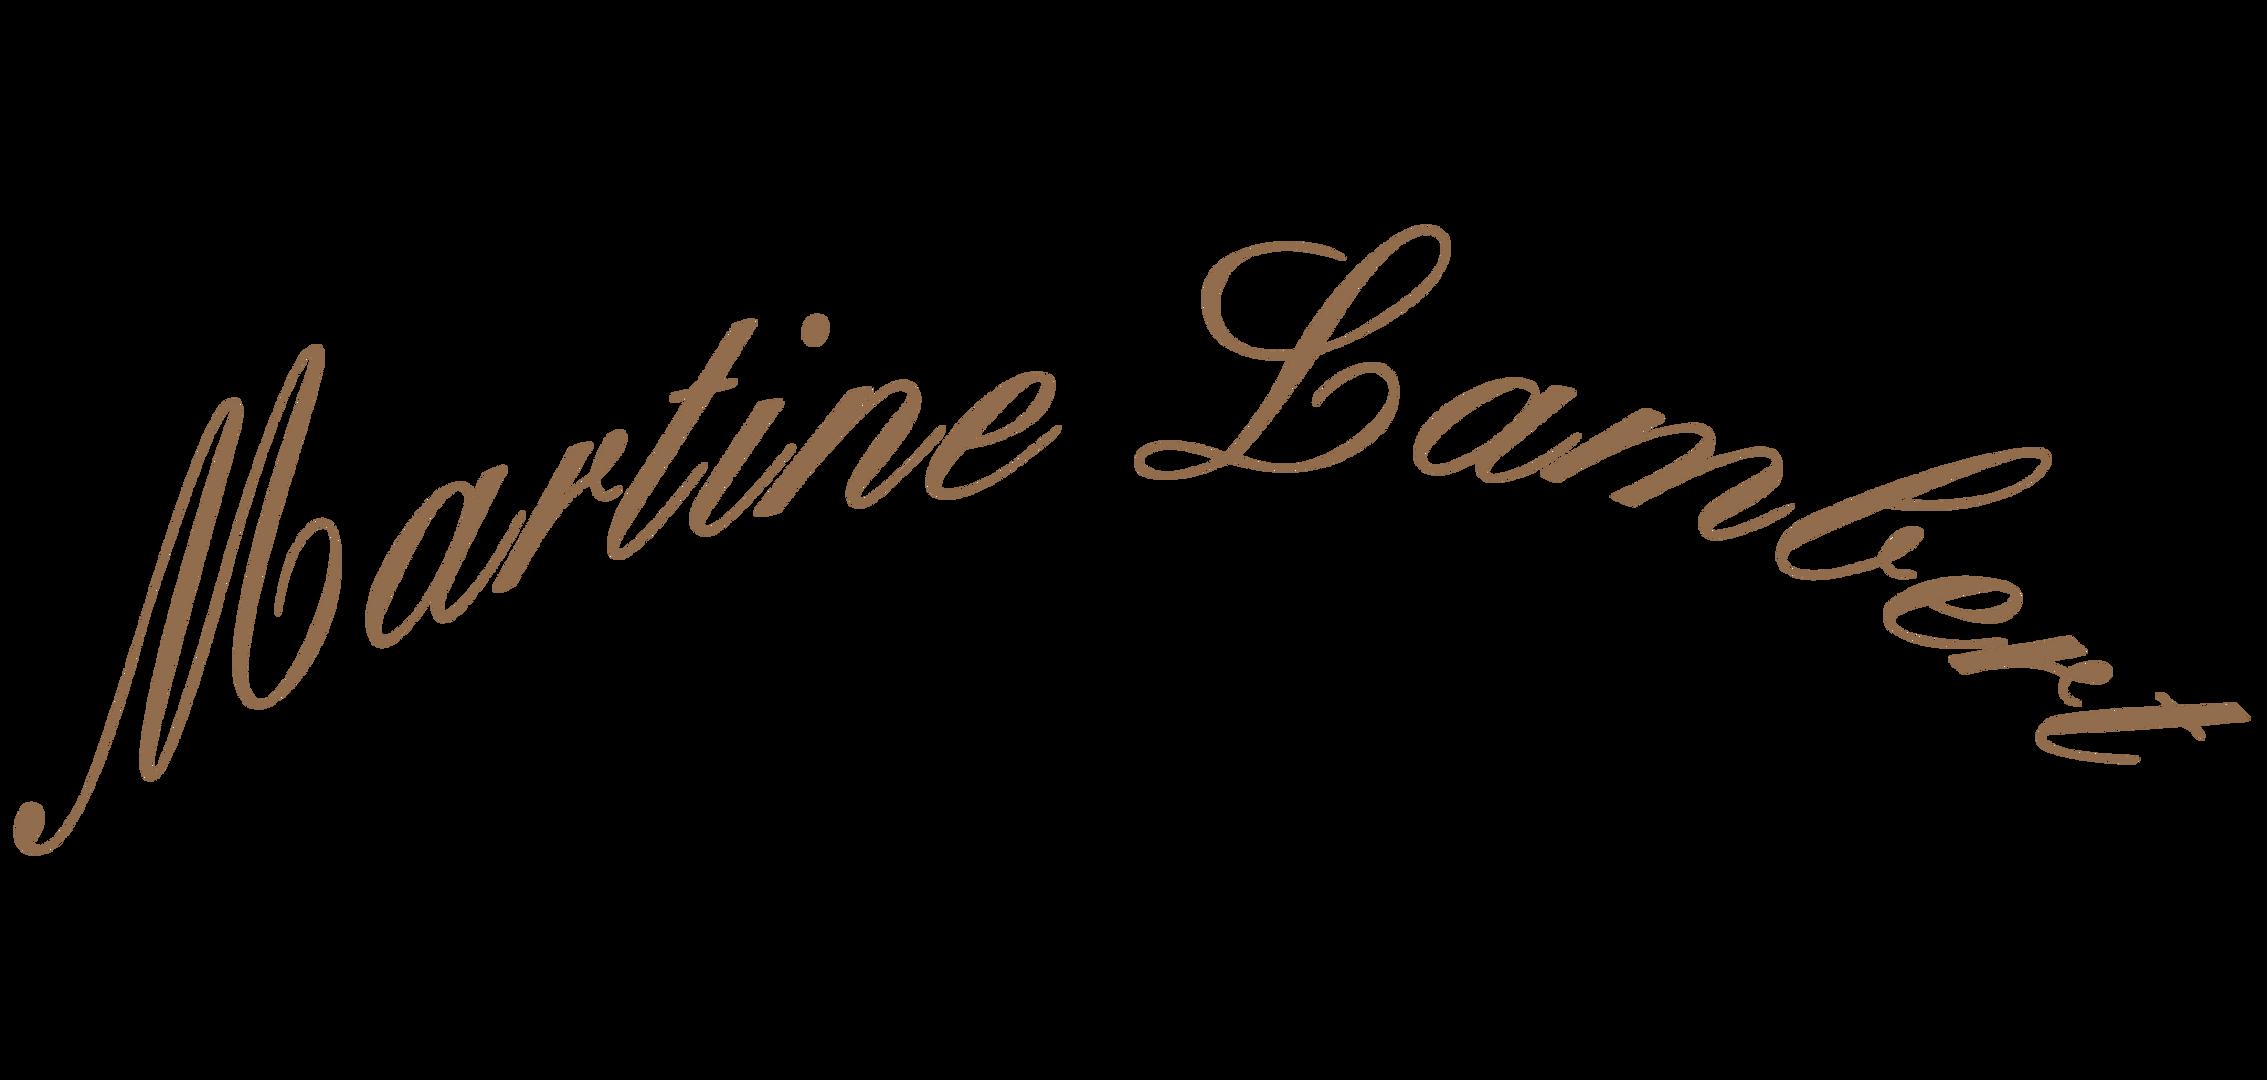 martine lambert.png